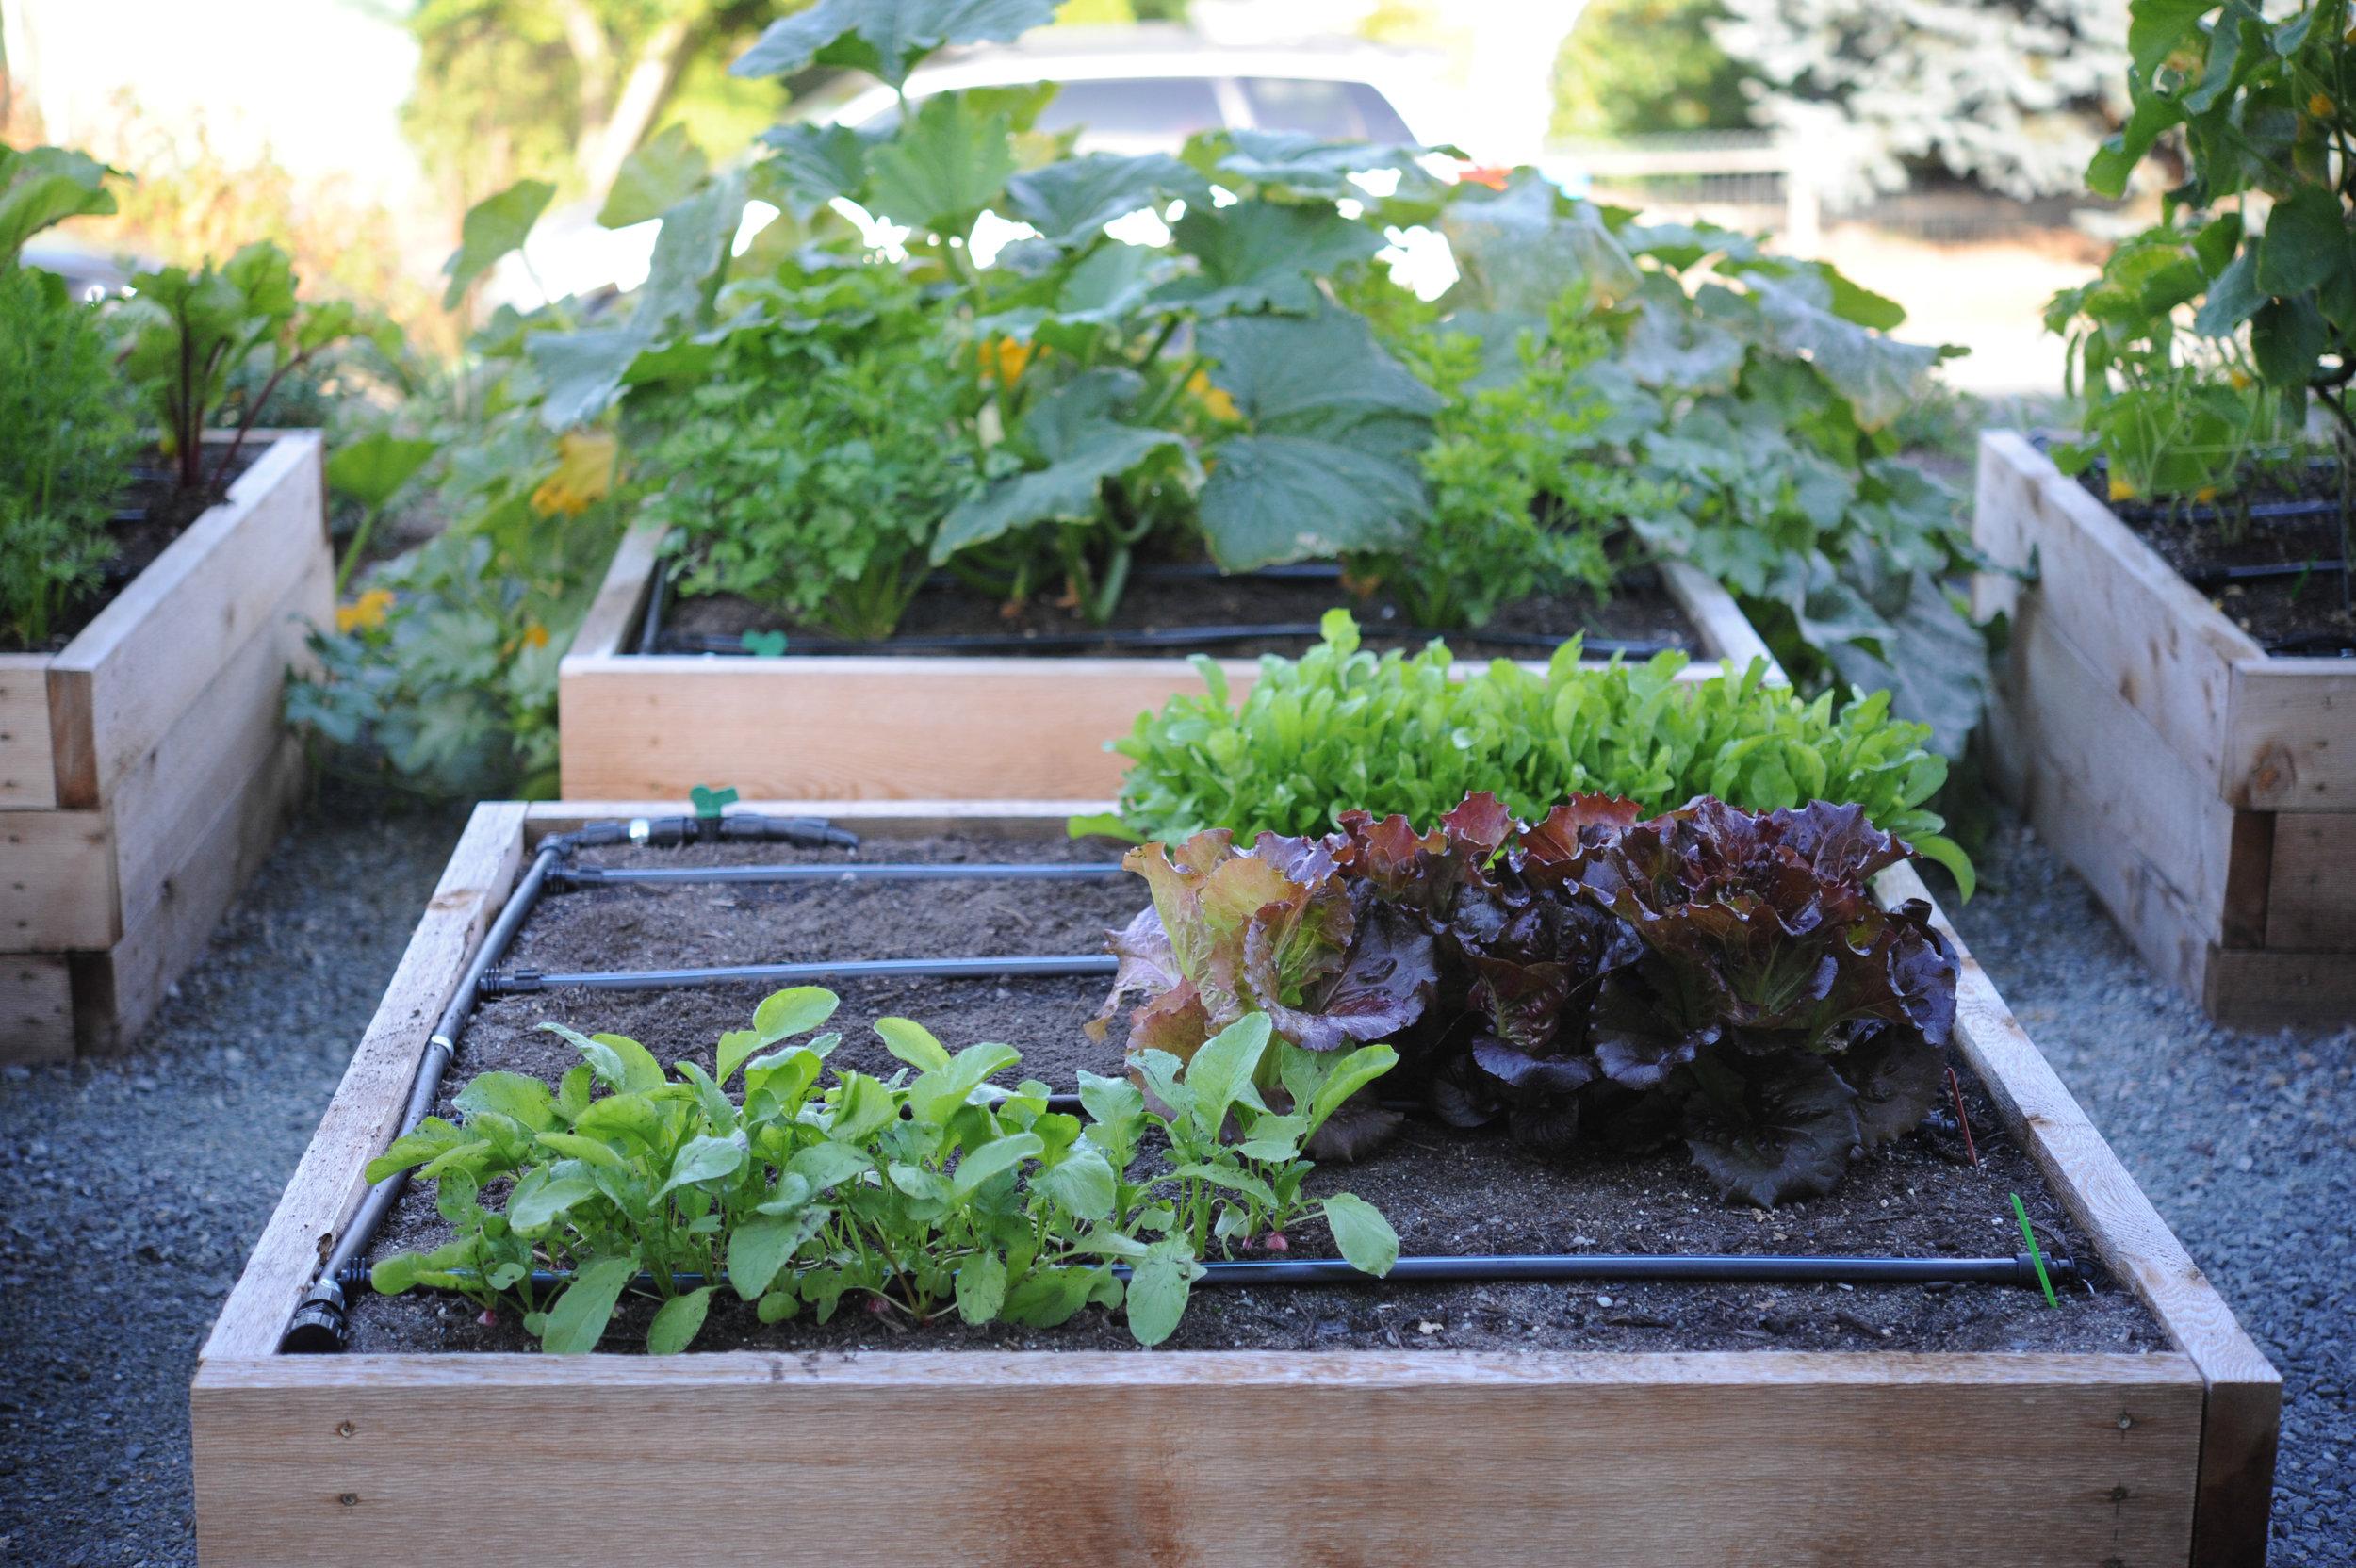 Garden Planning_Crop Lifespan_Hilary Dahl_Seattle Urban Farm Co.jpg